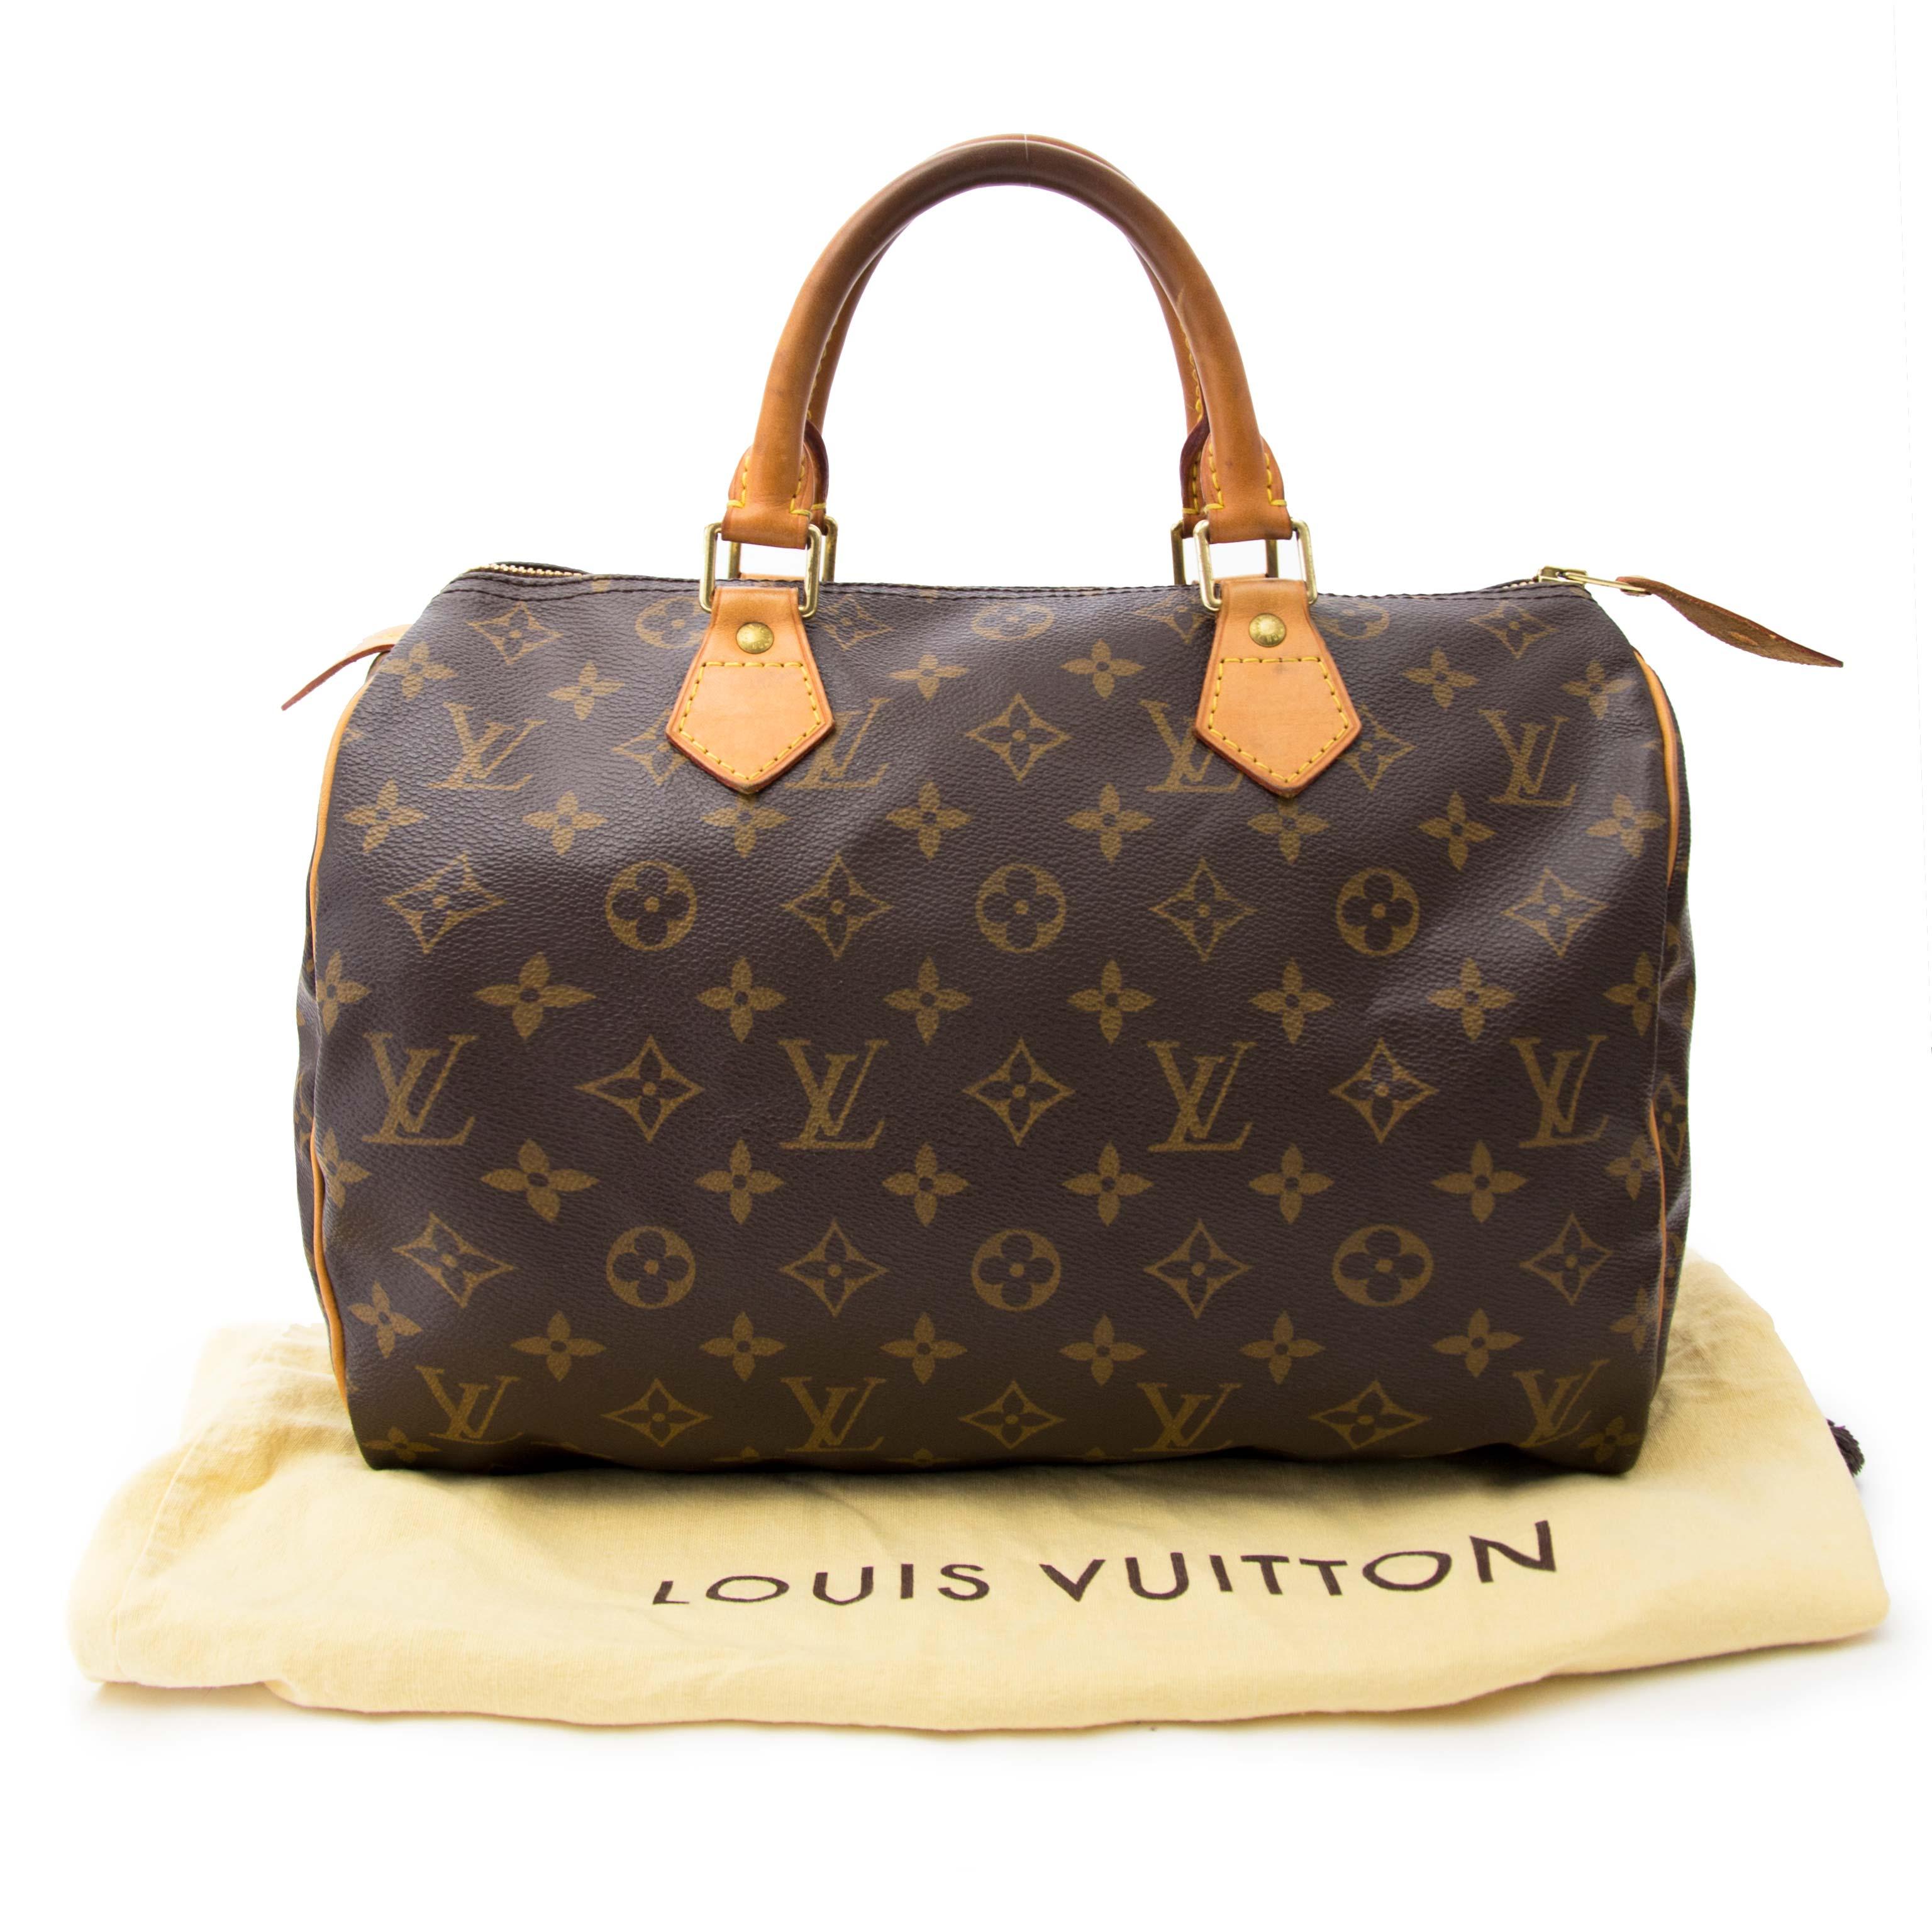 comme neuf sac a main Louis Vuitton Speedy 30